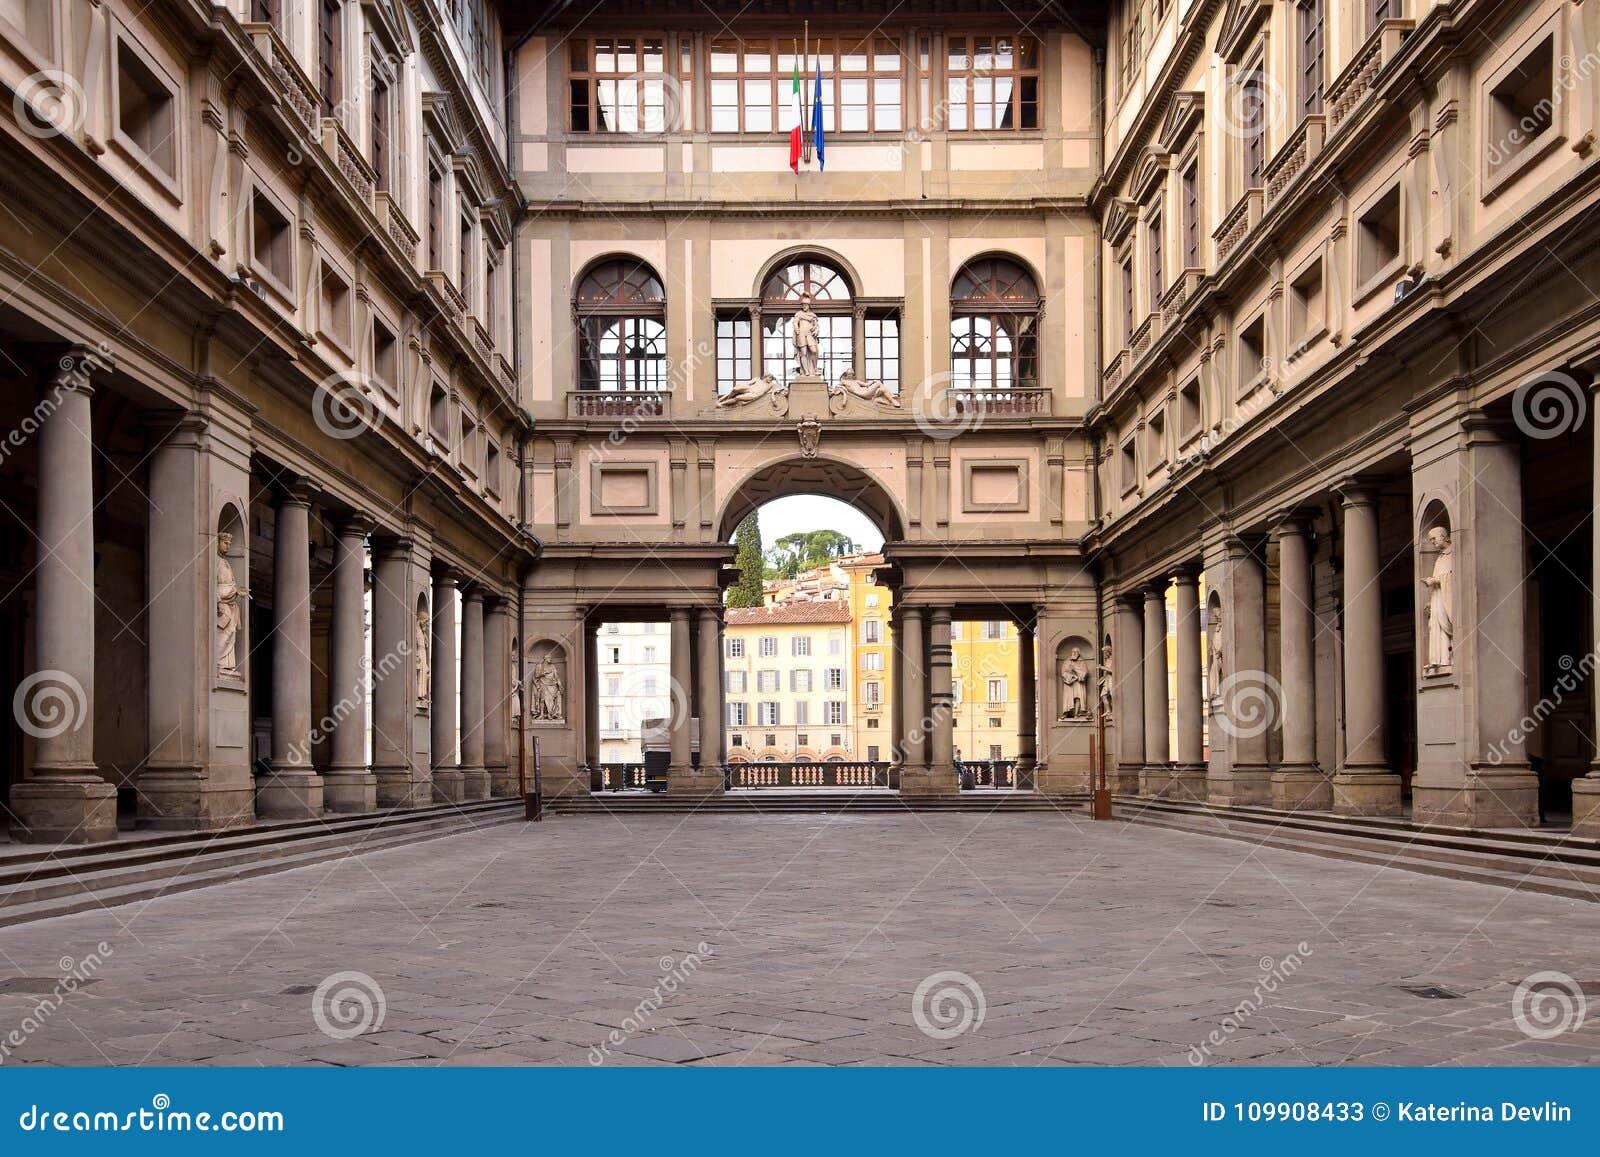 De Uffizi-Galerij in Florence